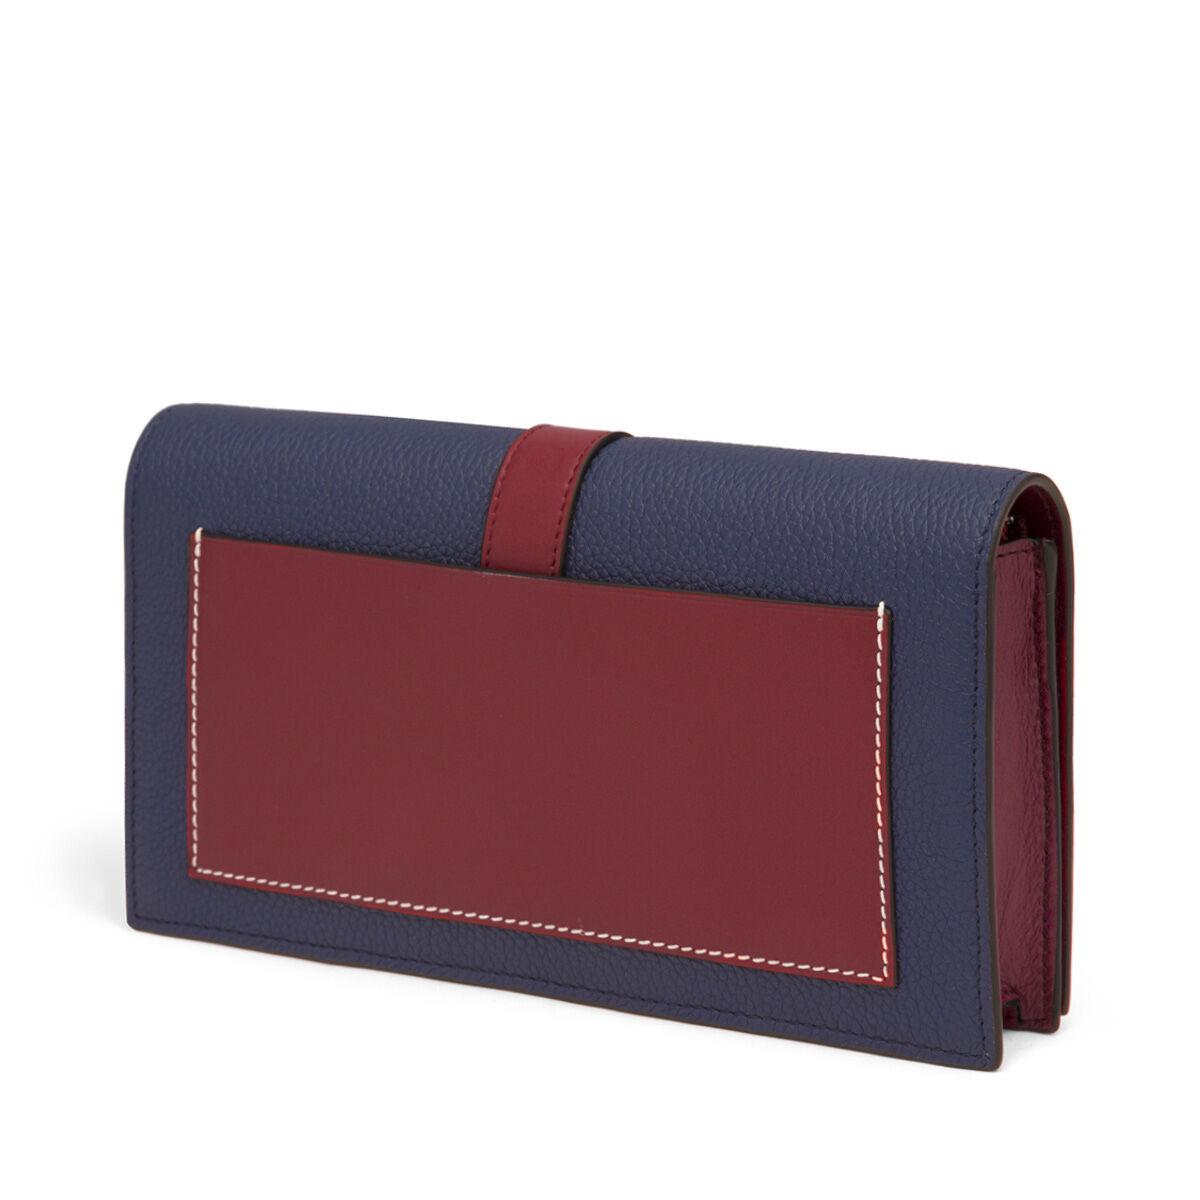 LOEWE Wallet On Chain Marine/Brick Red all